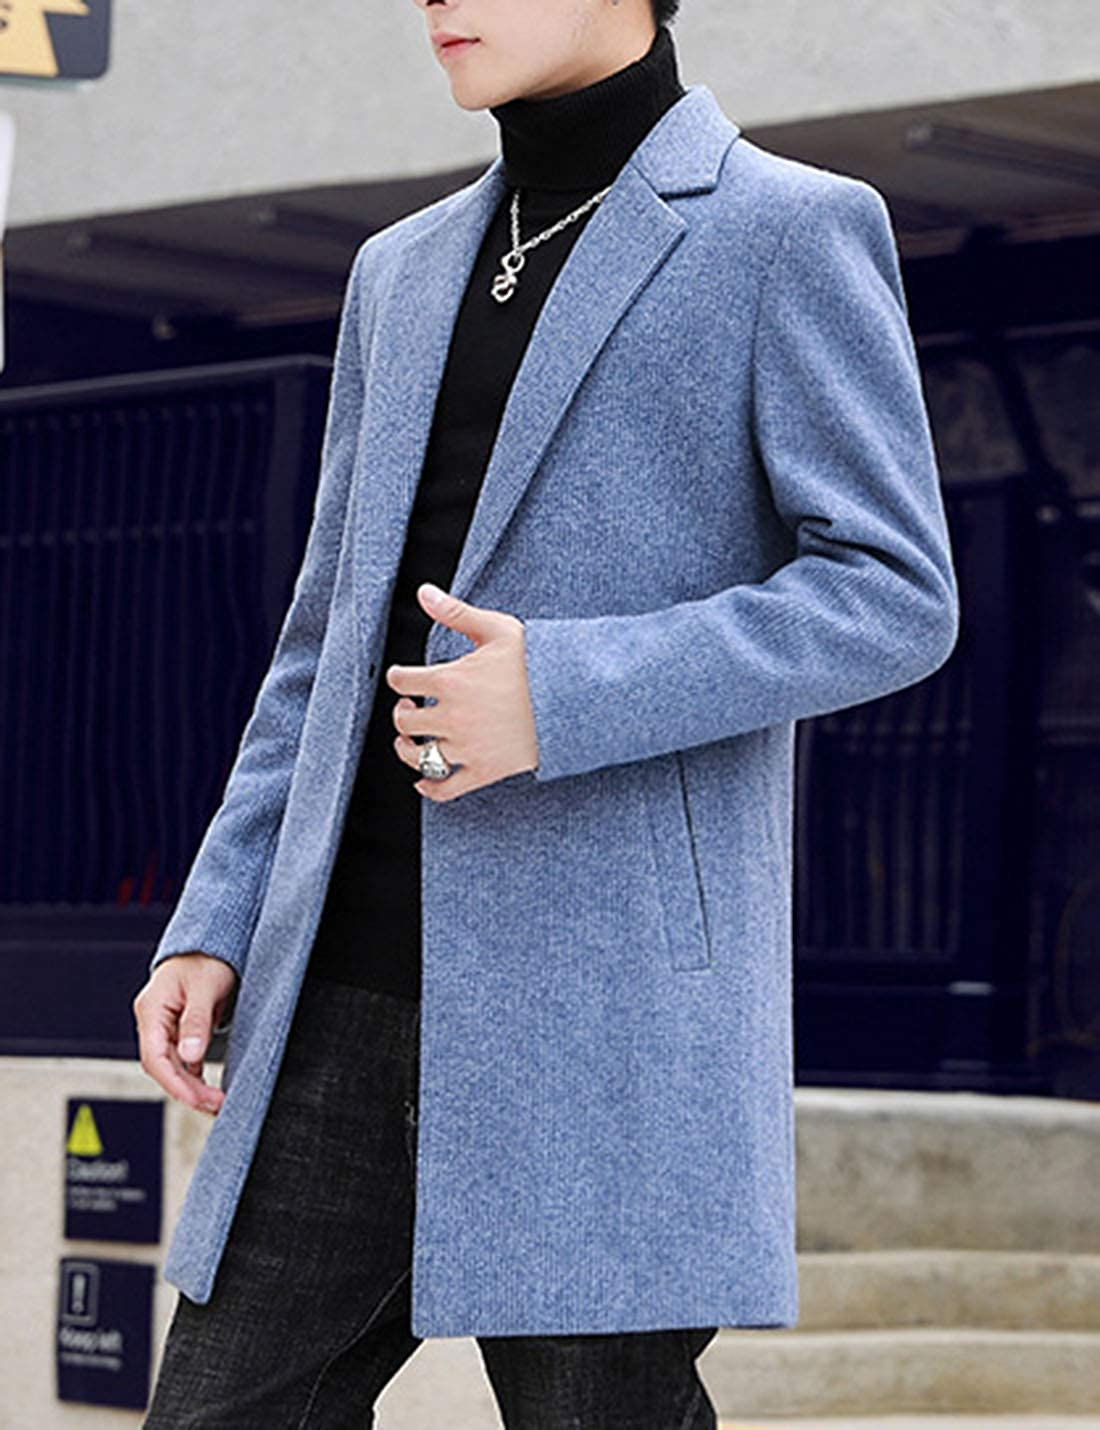 Uaneo Men's Casaul Slim Lapel Collar Houndstooth Mid Long Wool Blend Pea Coat(Blue-L)